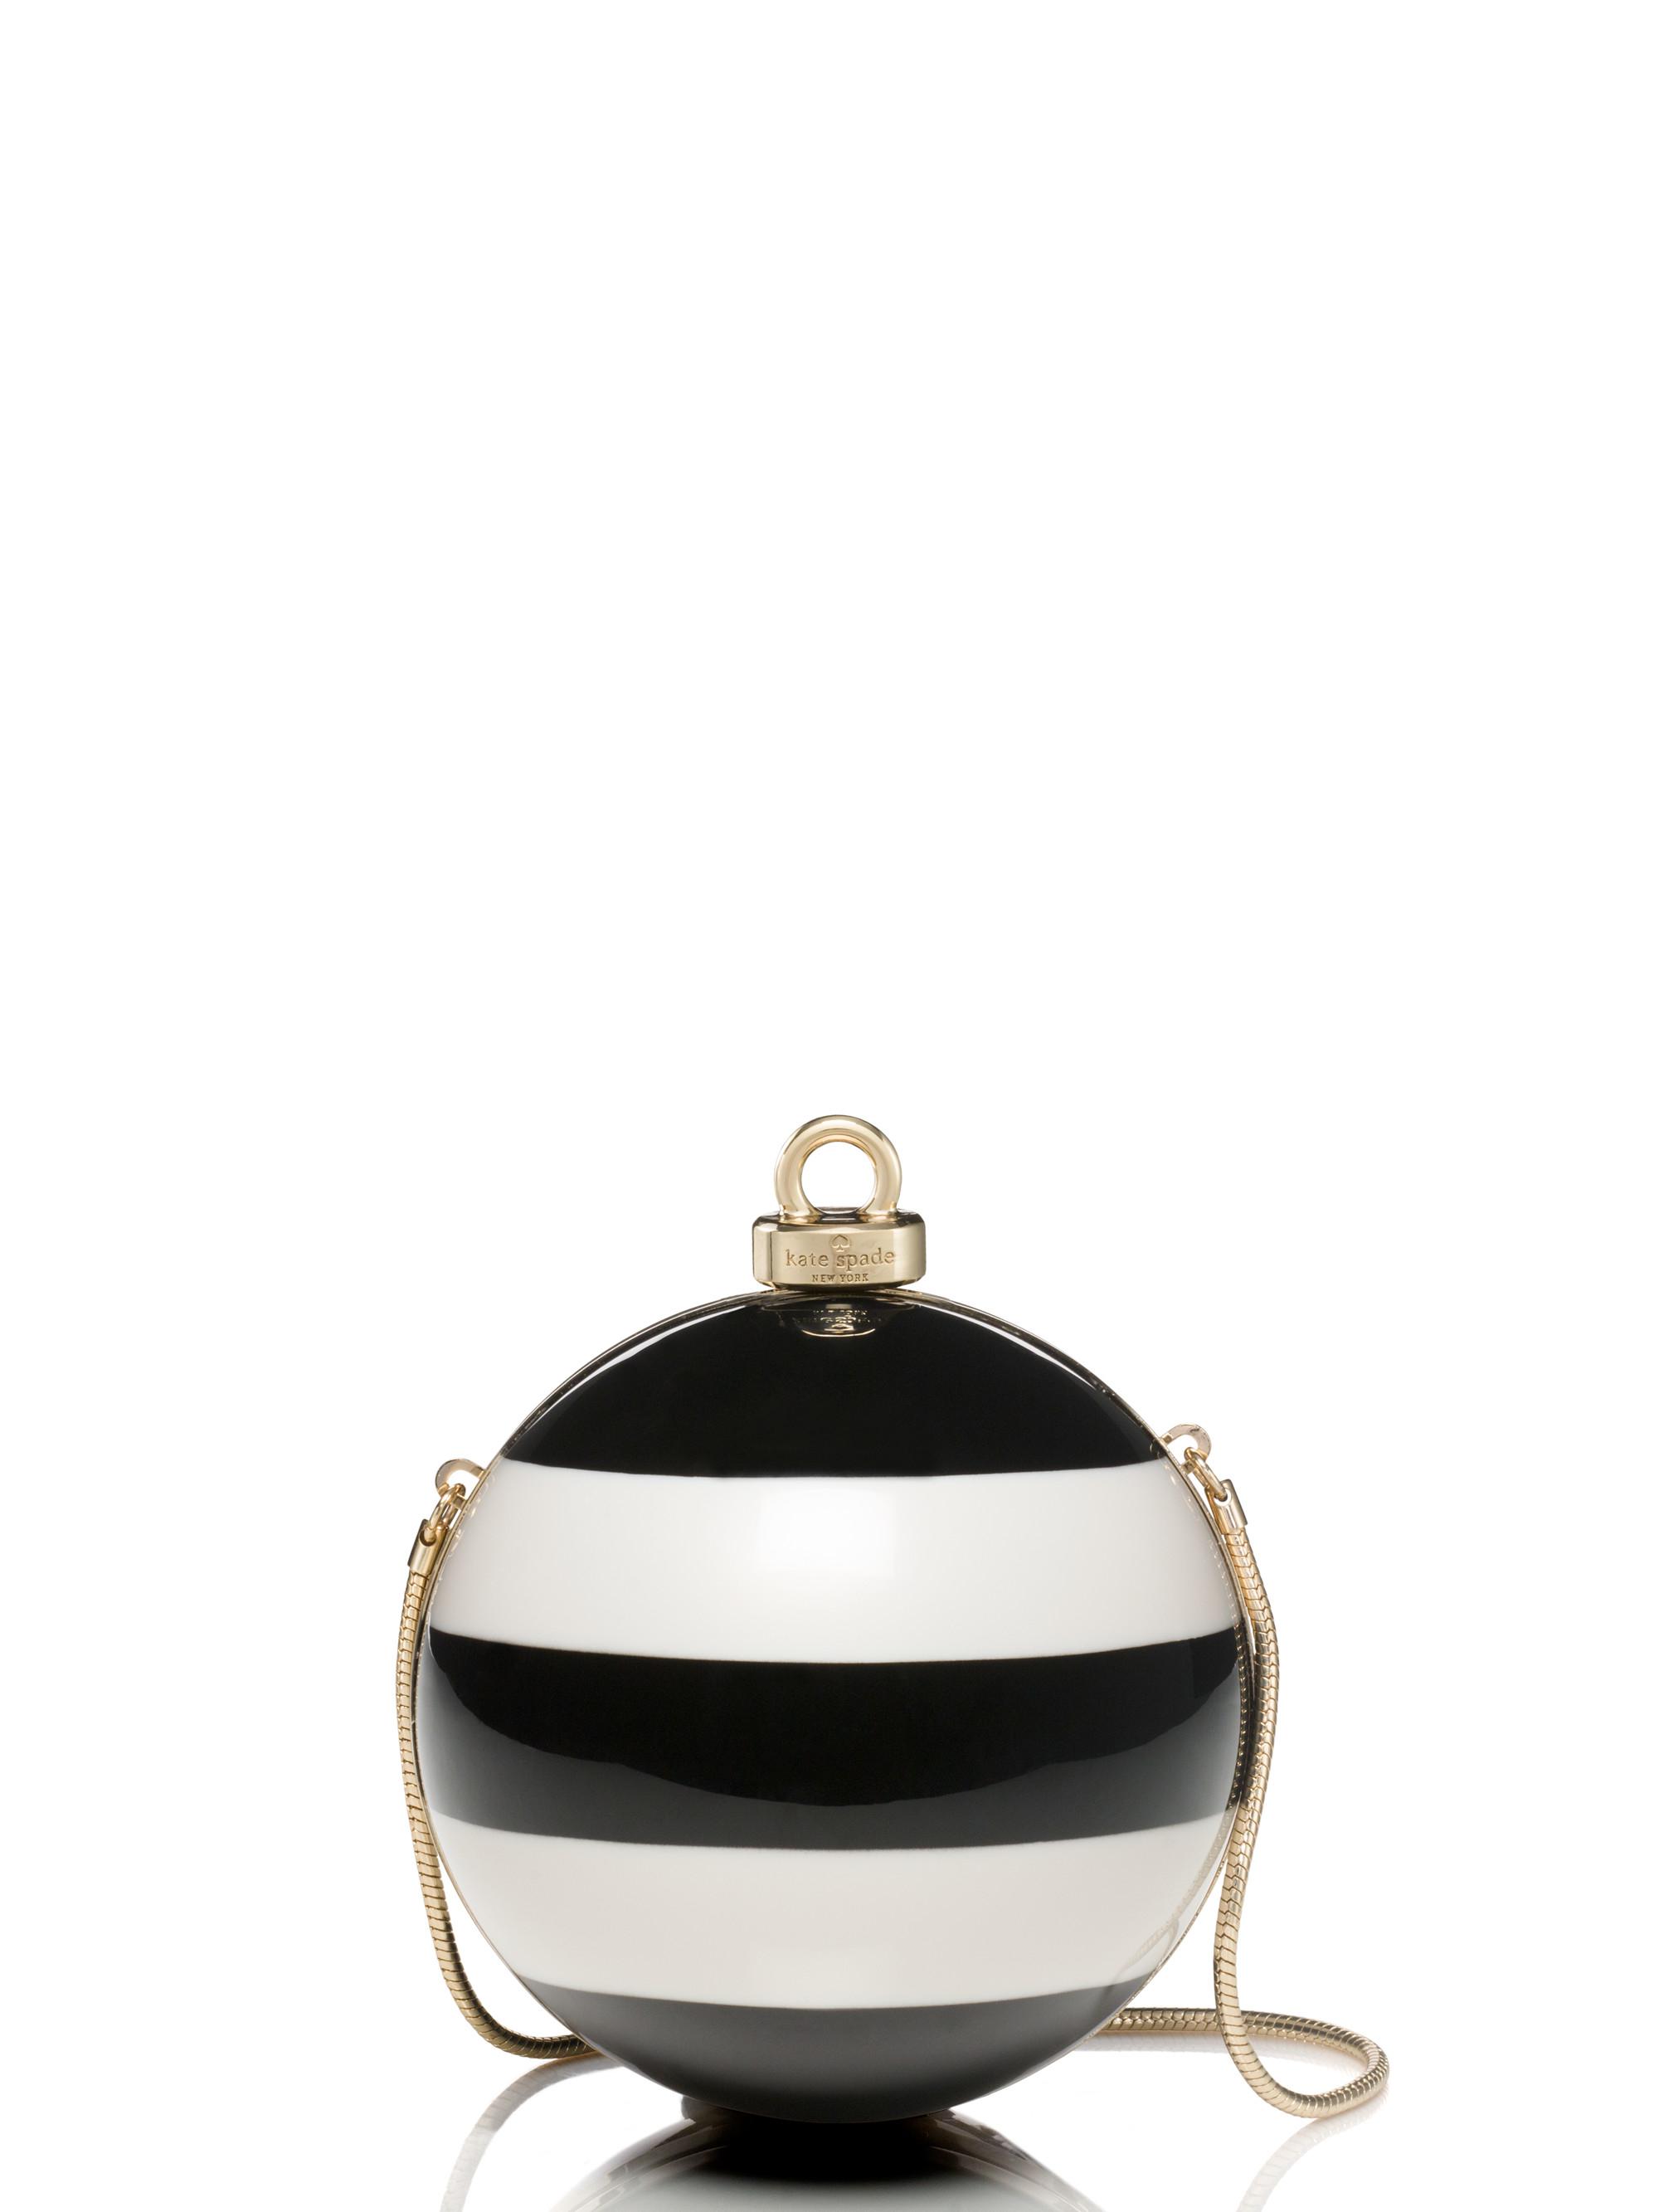 Lyst - Kate Spade New York Stripe Ornament Clutch in Black